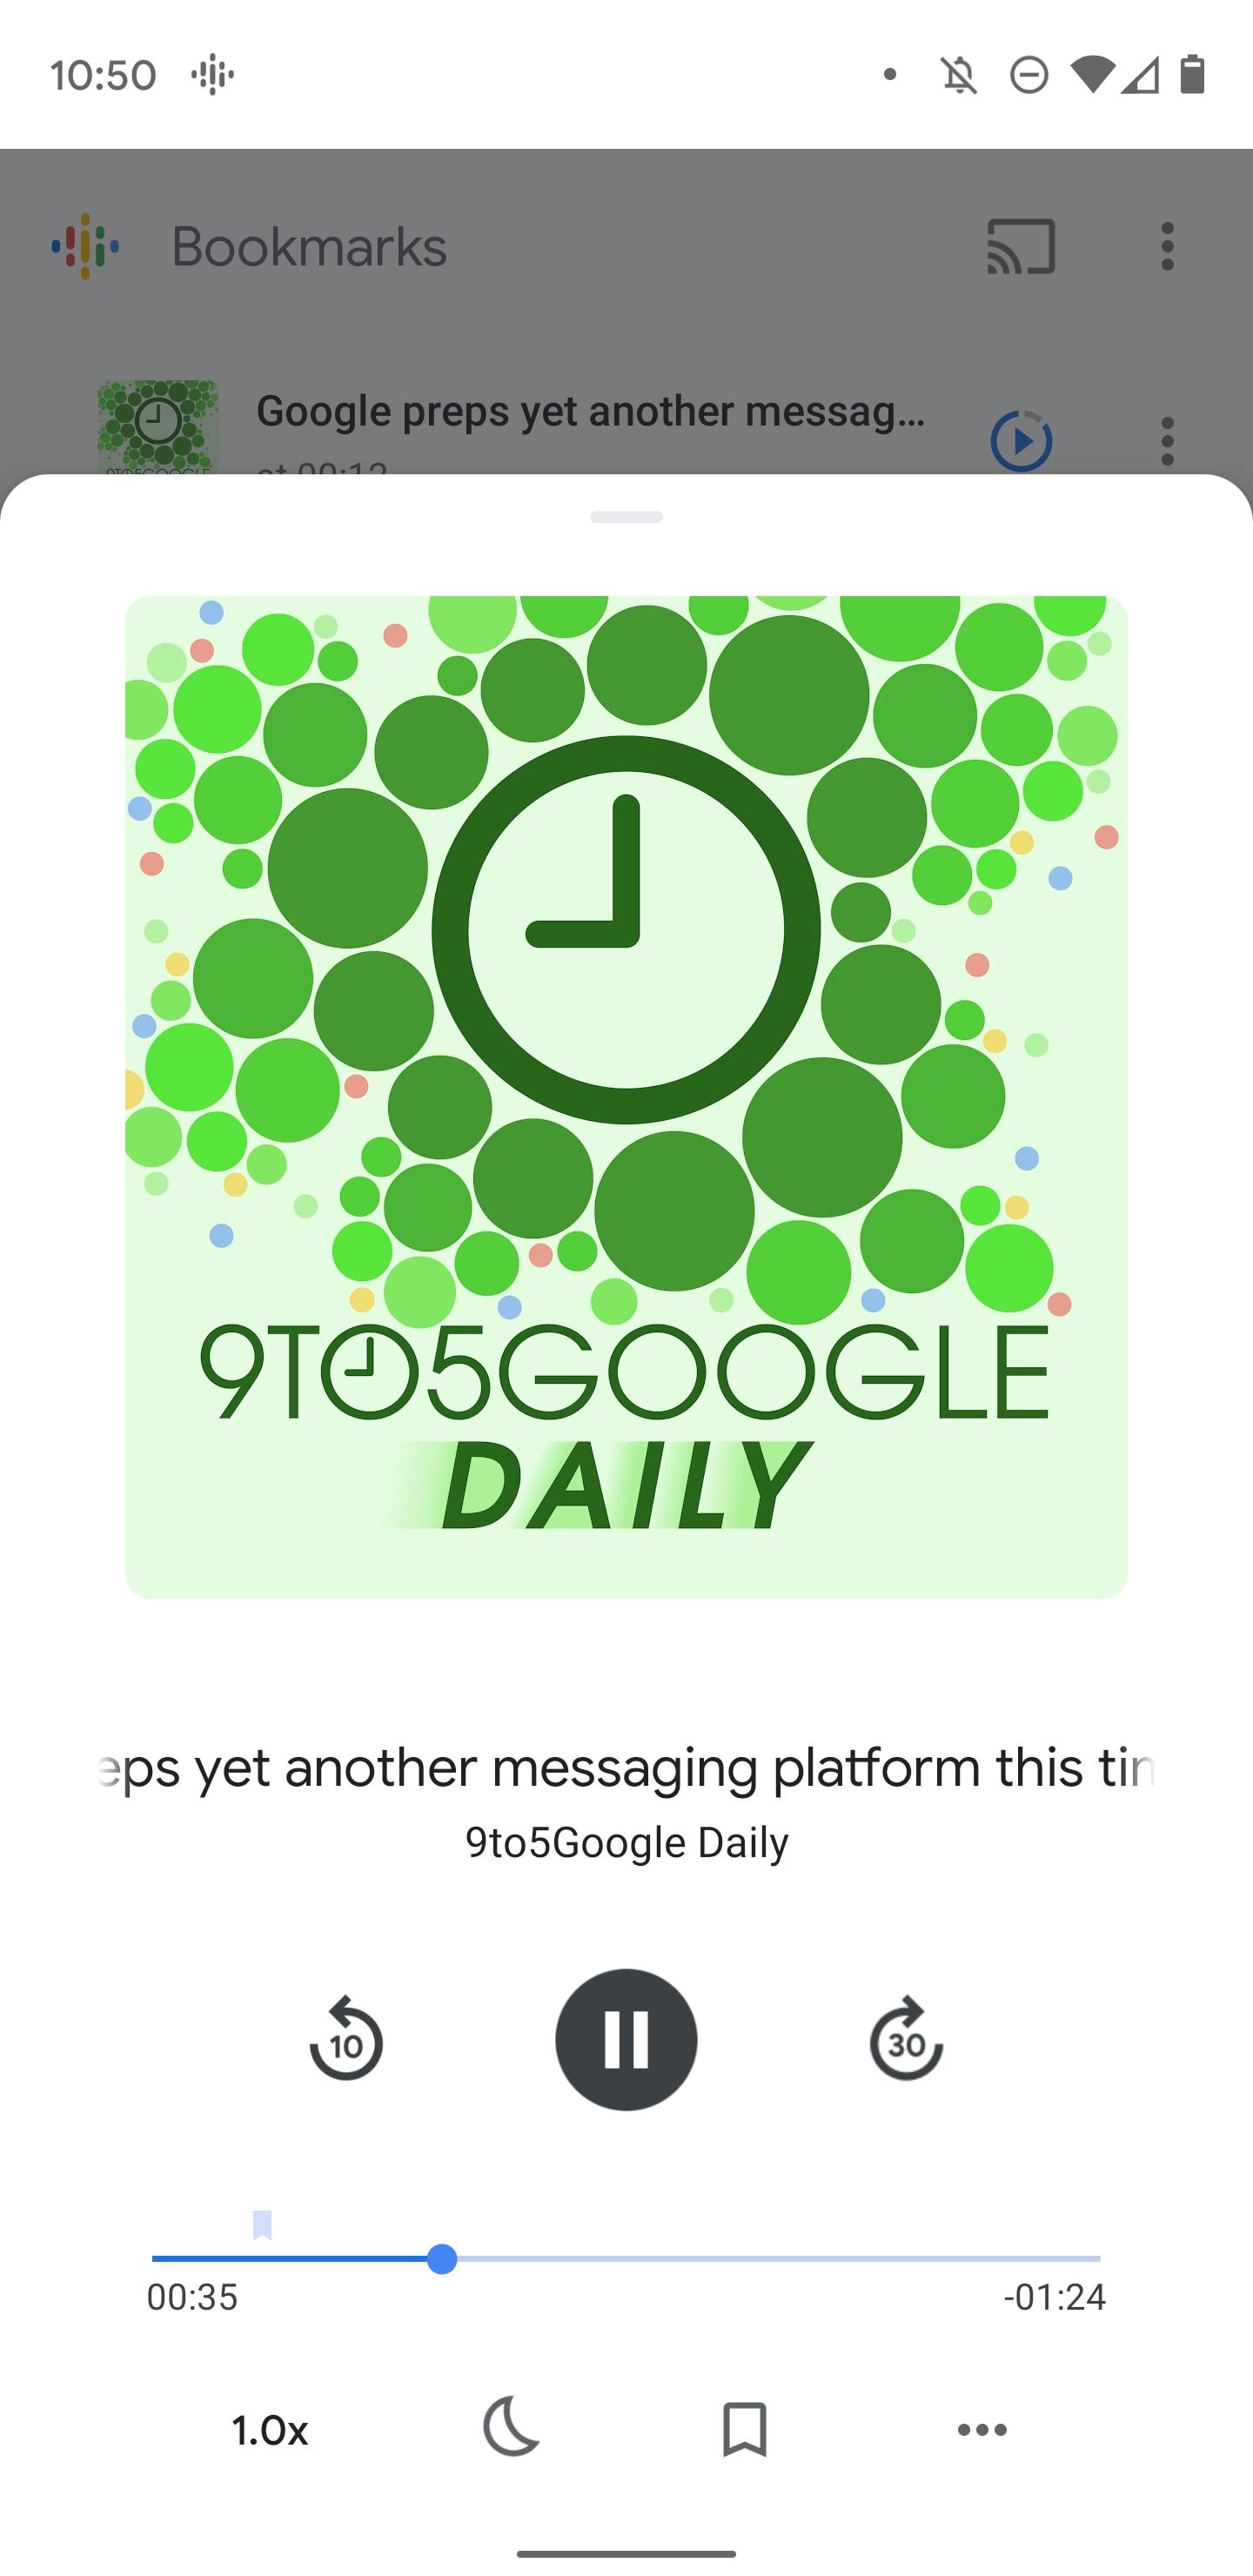 google-app-10-61-podcasts-bookmarks-1